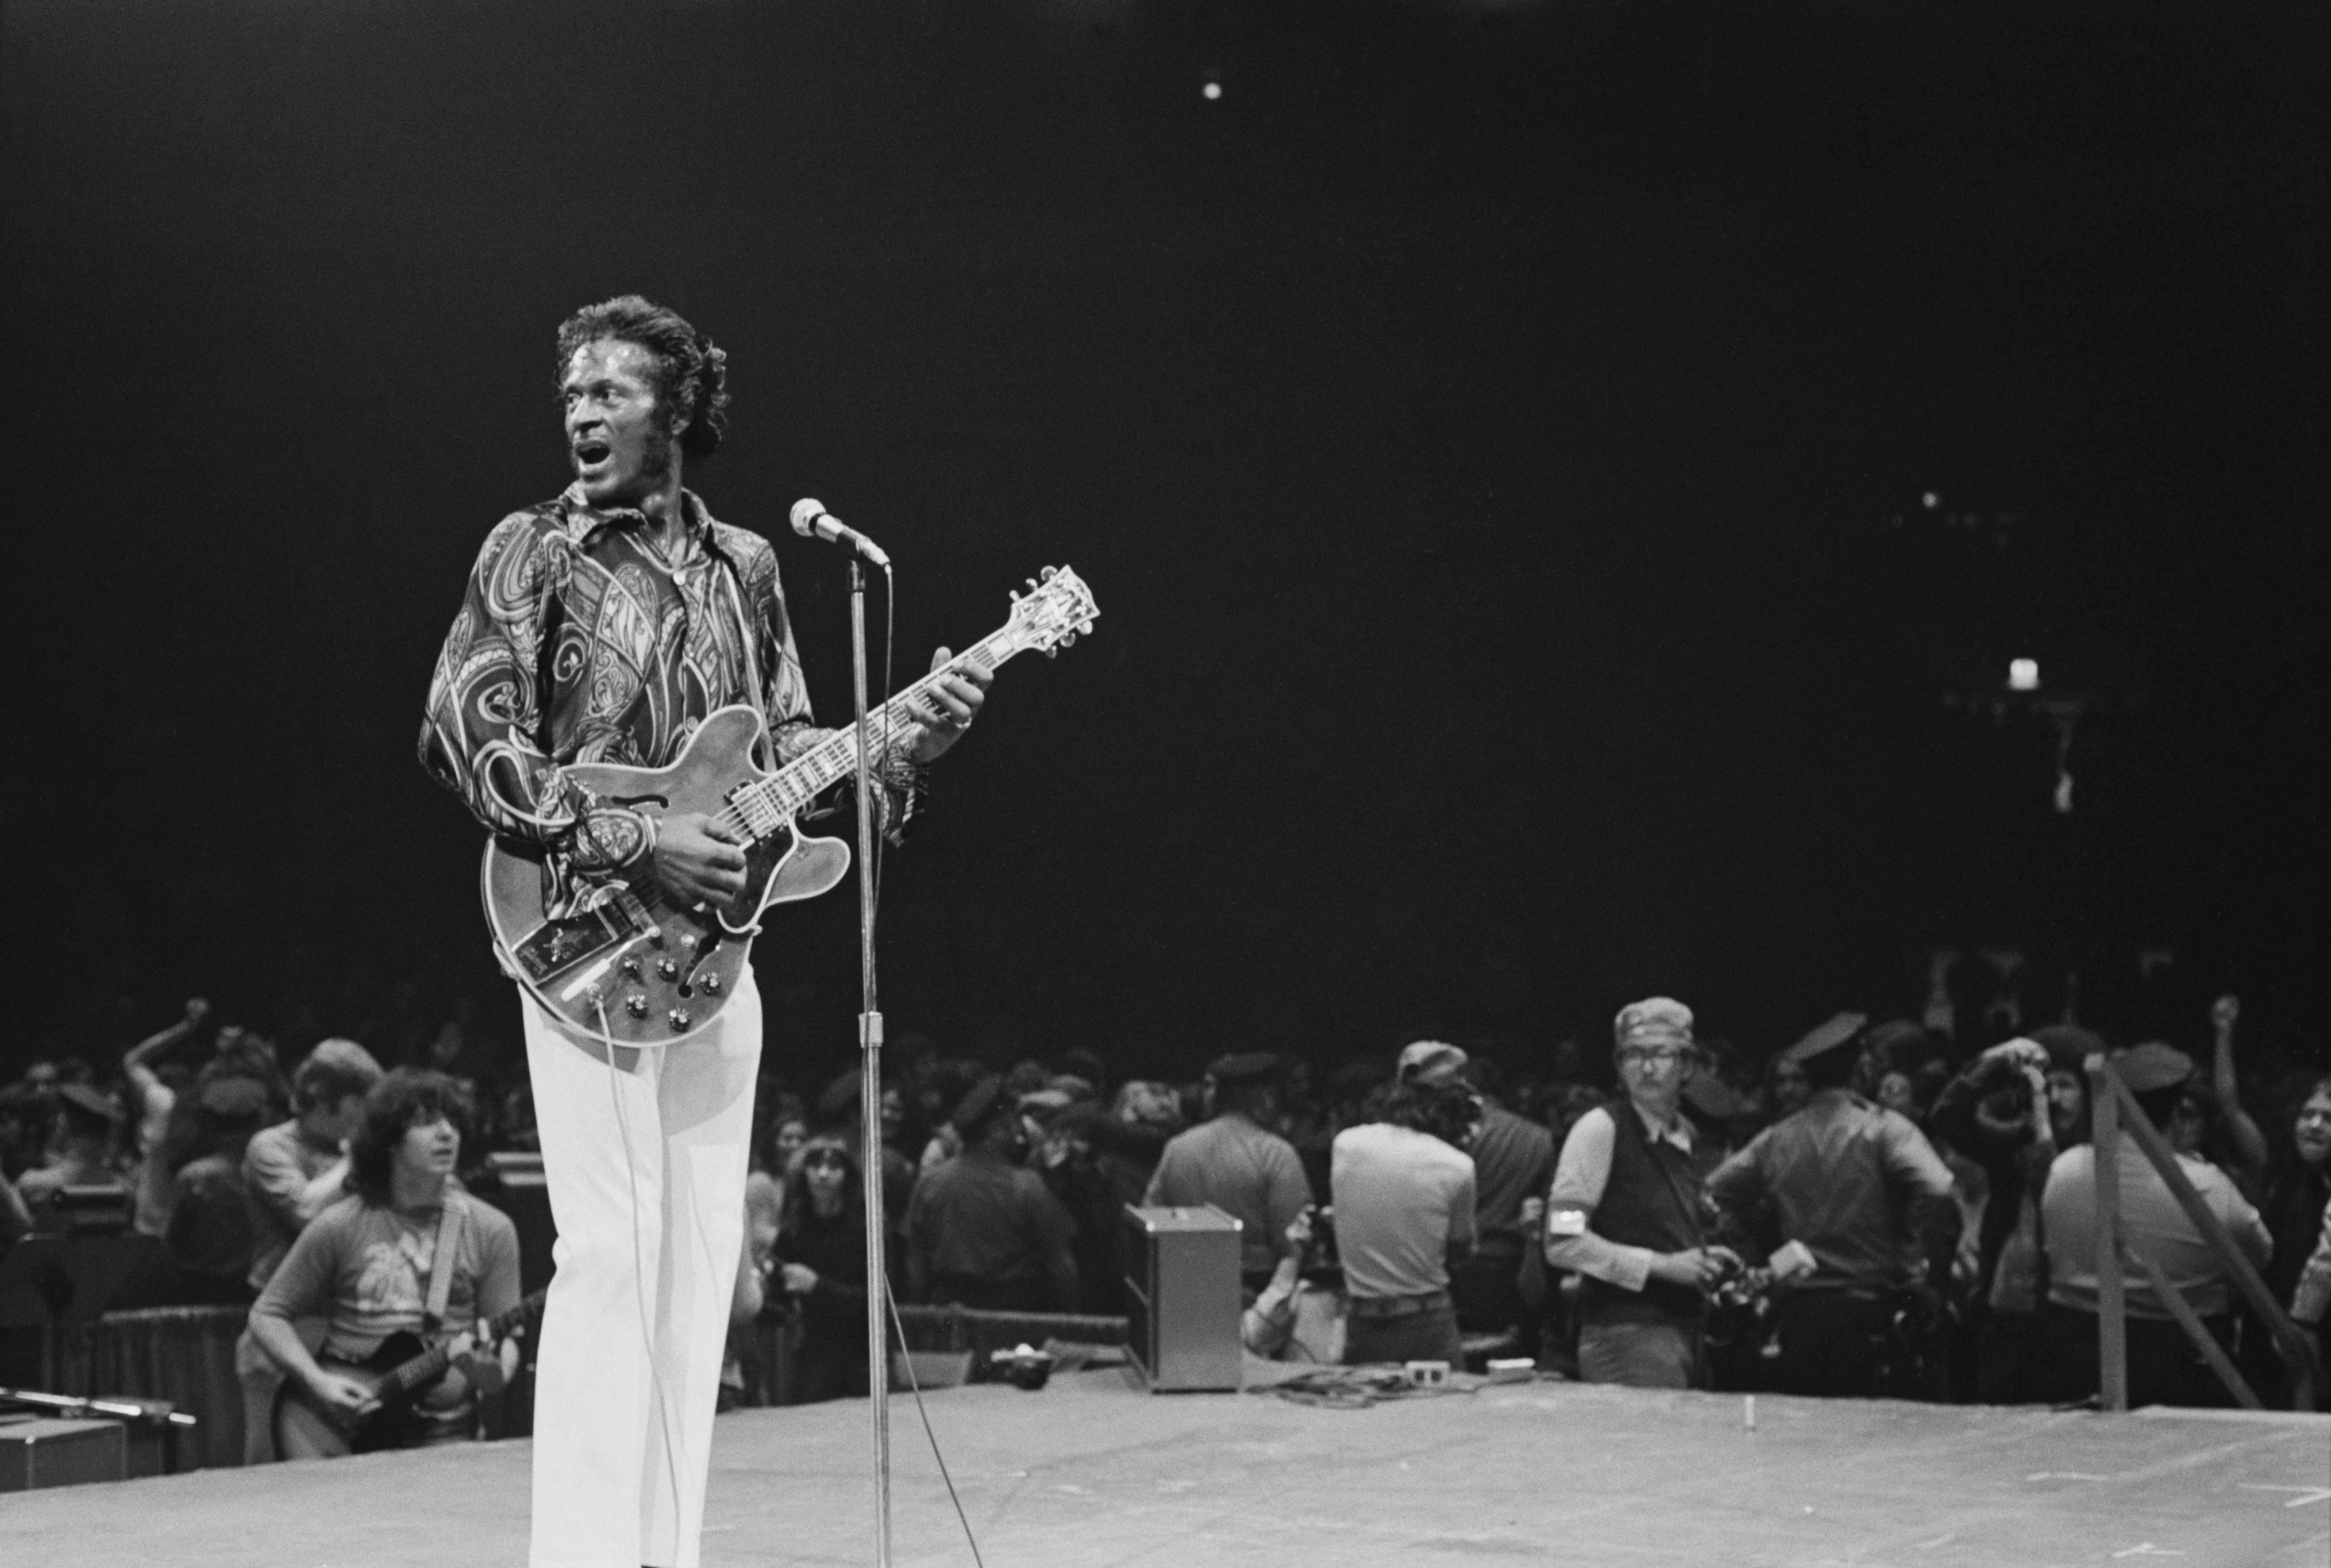 met museum rock and roll exhibit Chuck Berry jimi hendrix the beatles st vincent